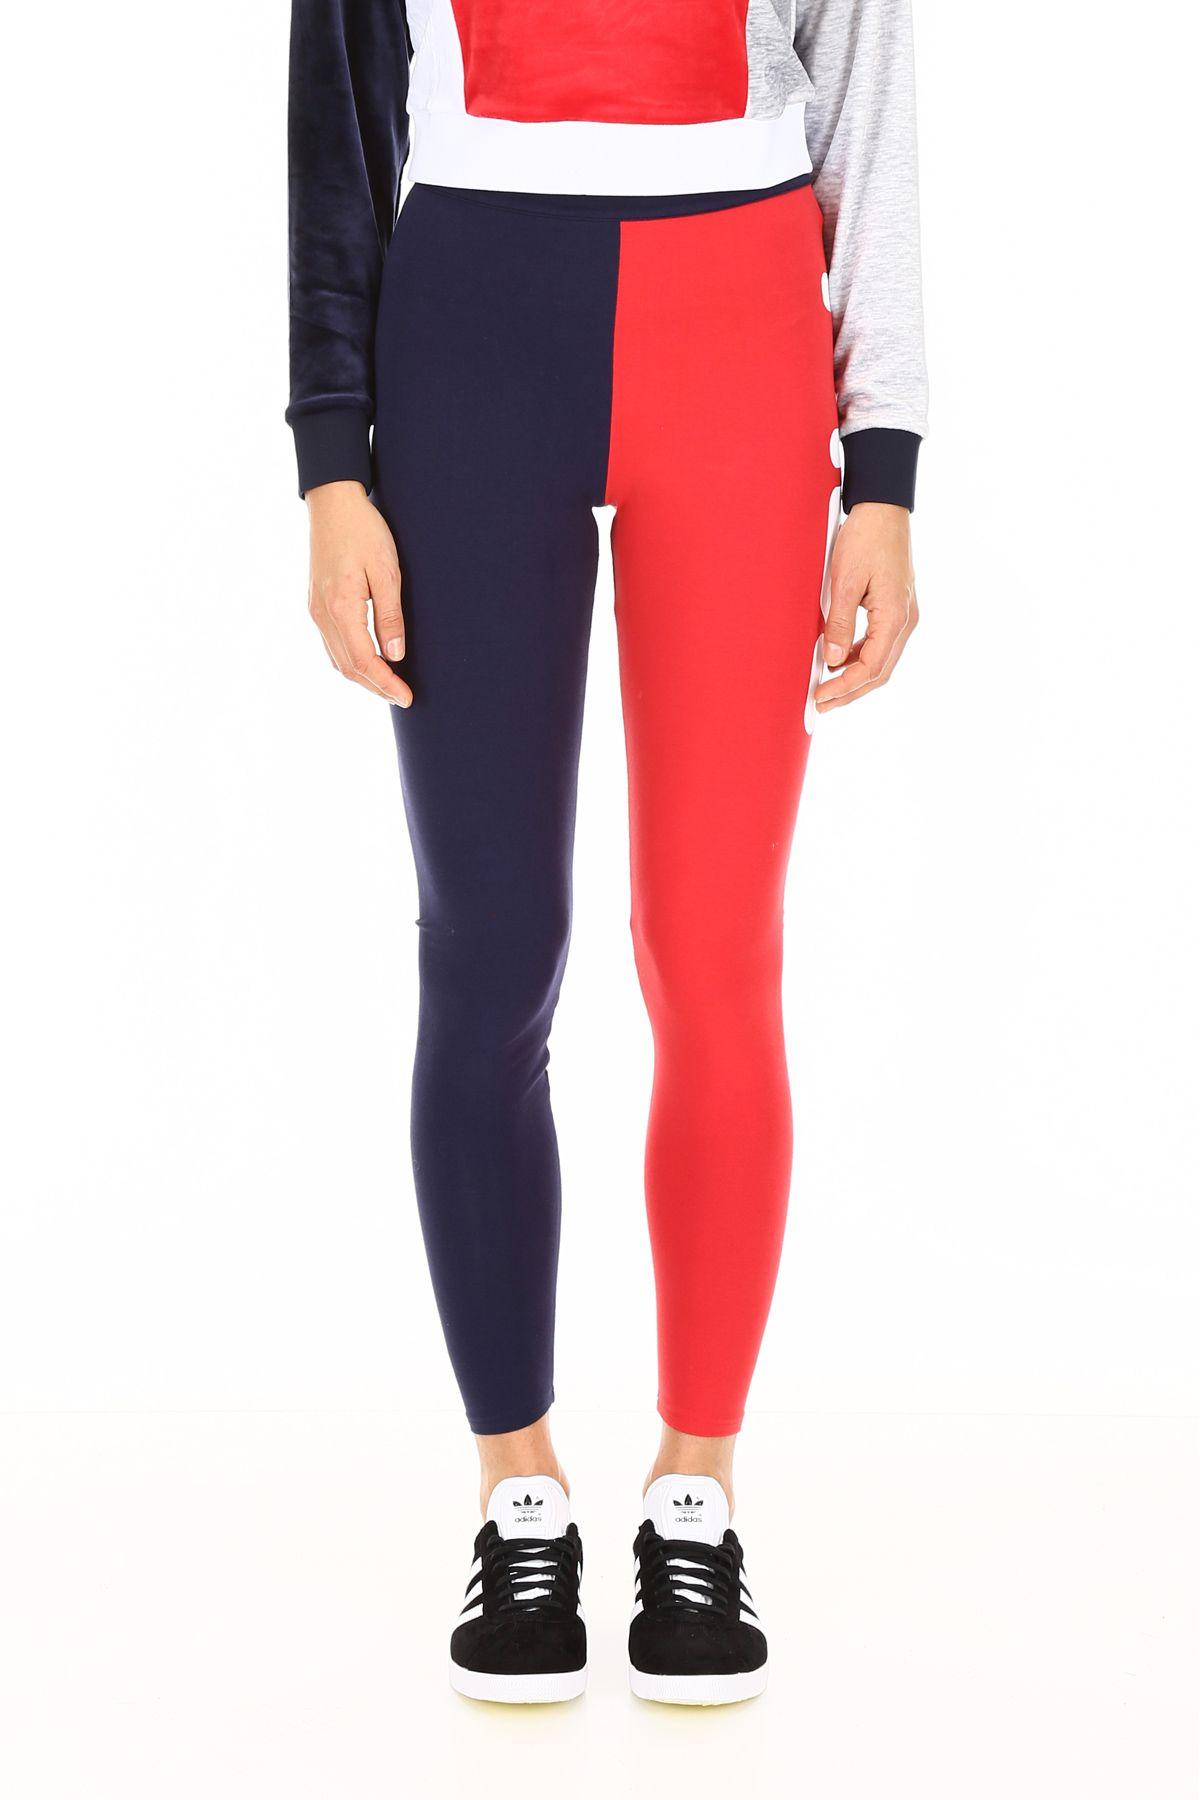 c5aaa0fd27385 ... Fila Bicolor Leggings With Logo Print - PEACOAT RED (Blue) ...